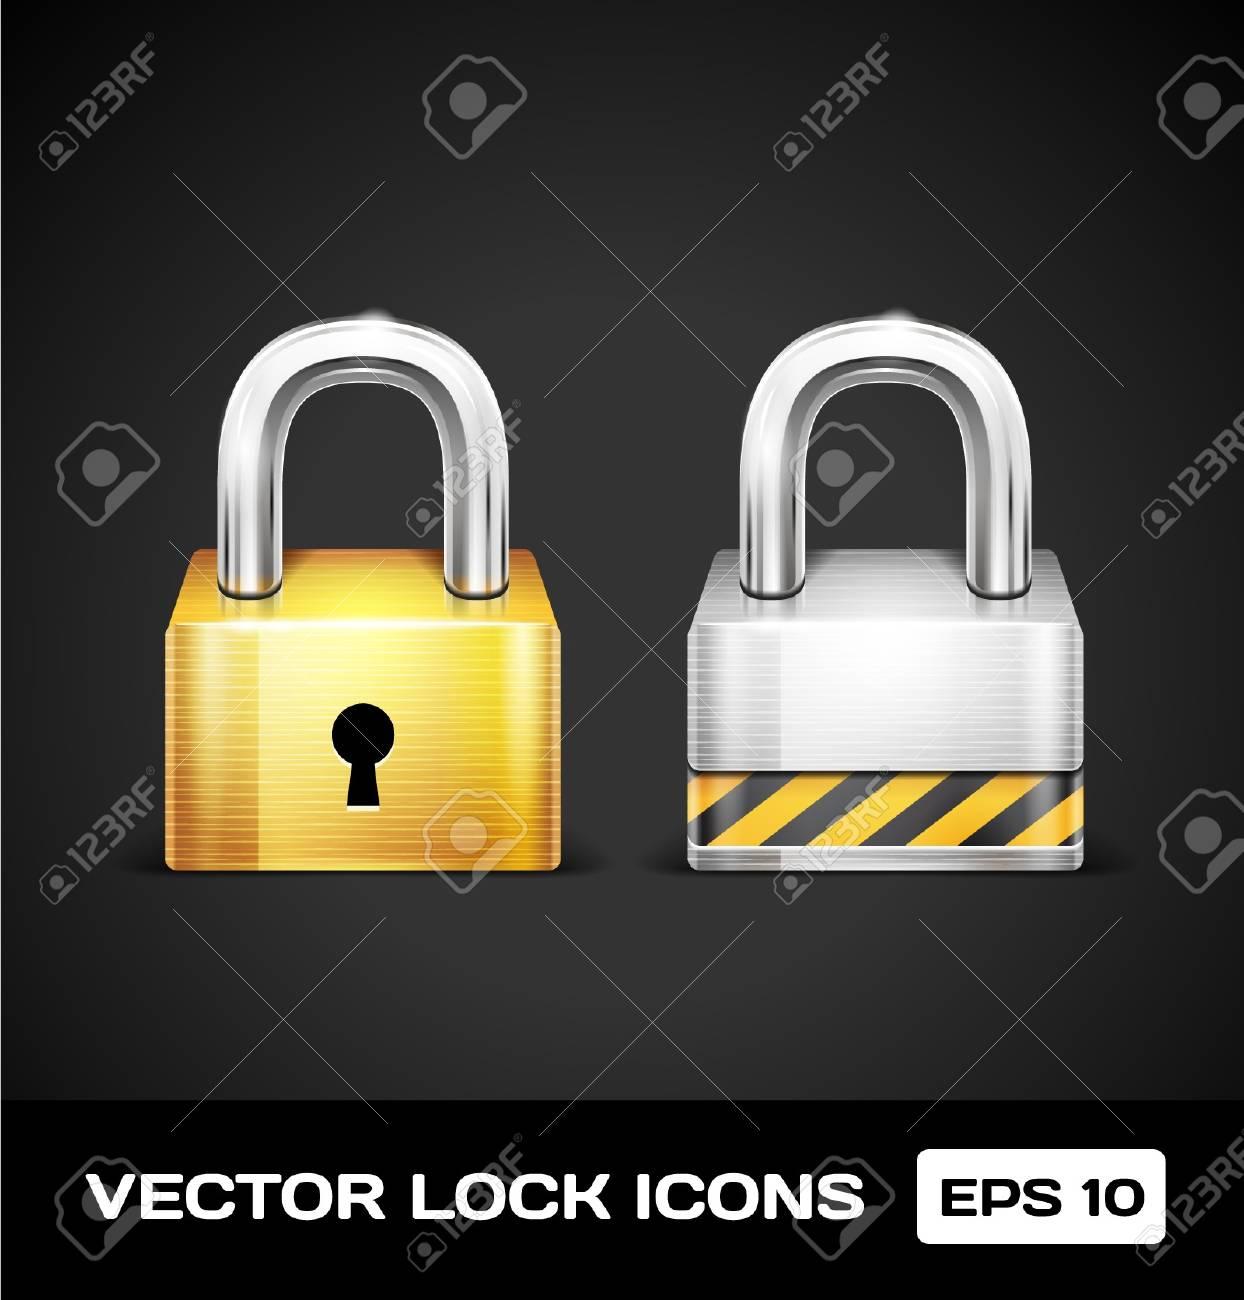 Lock Icons Stock Vector - 17315520